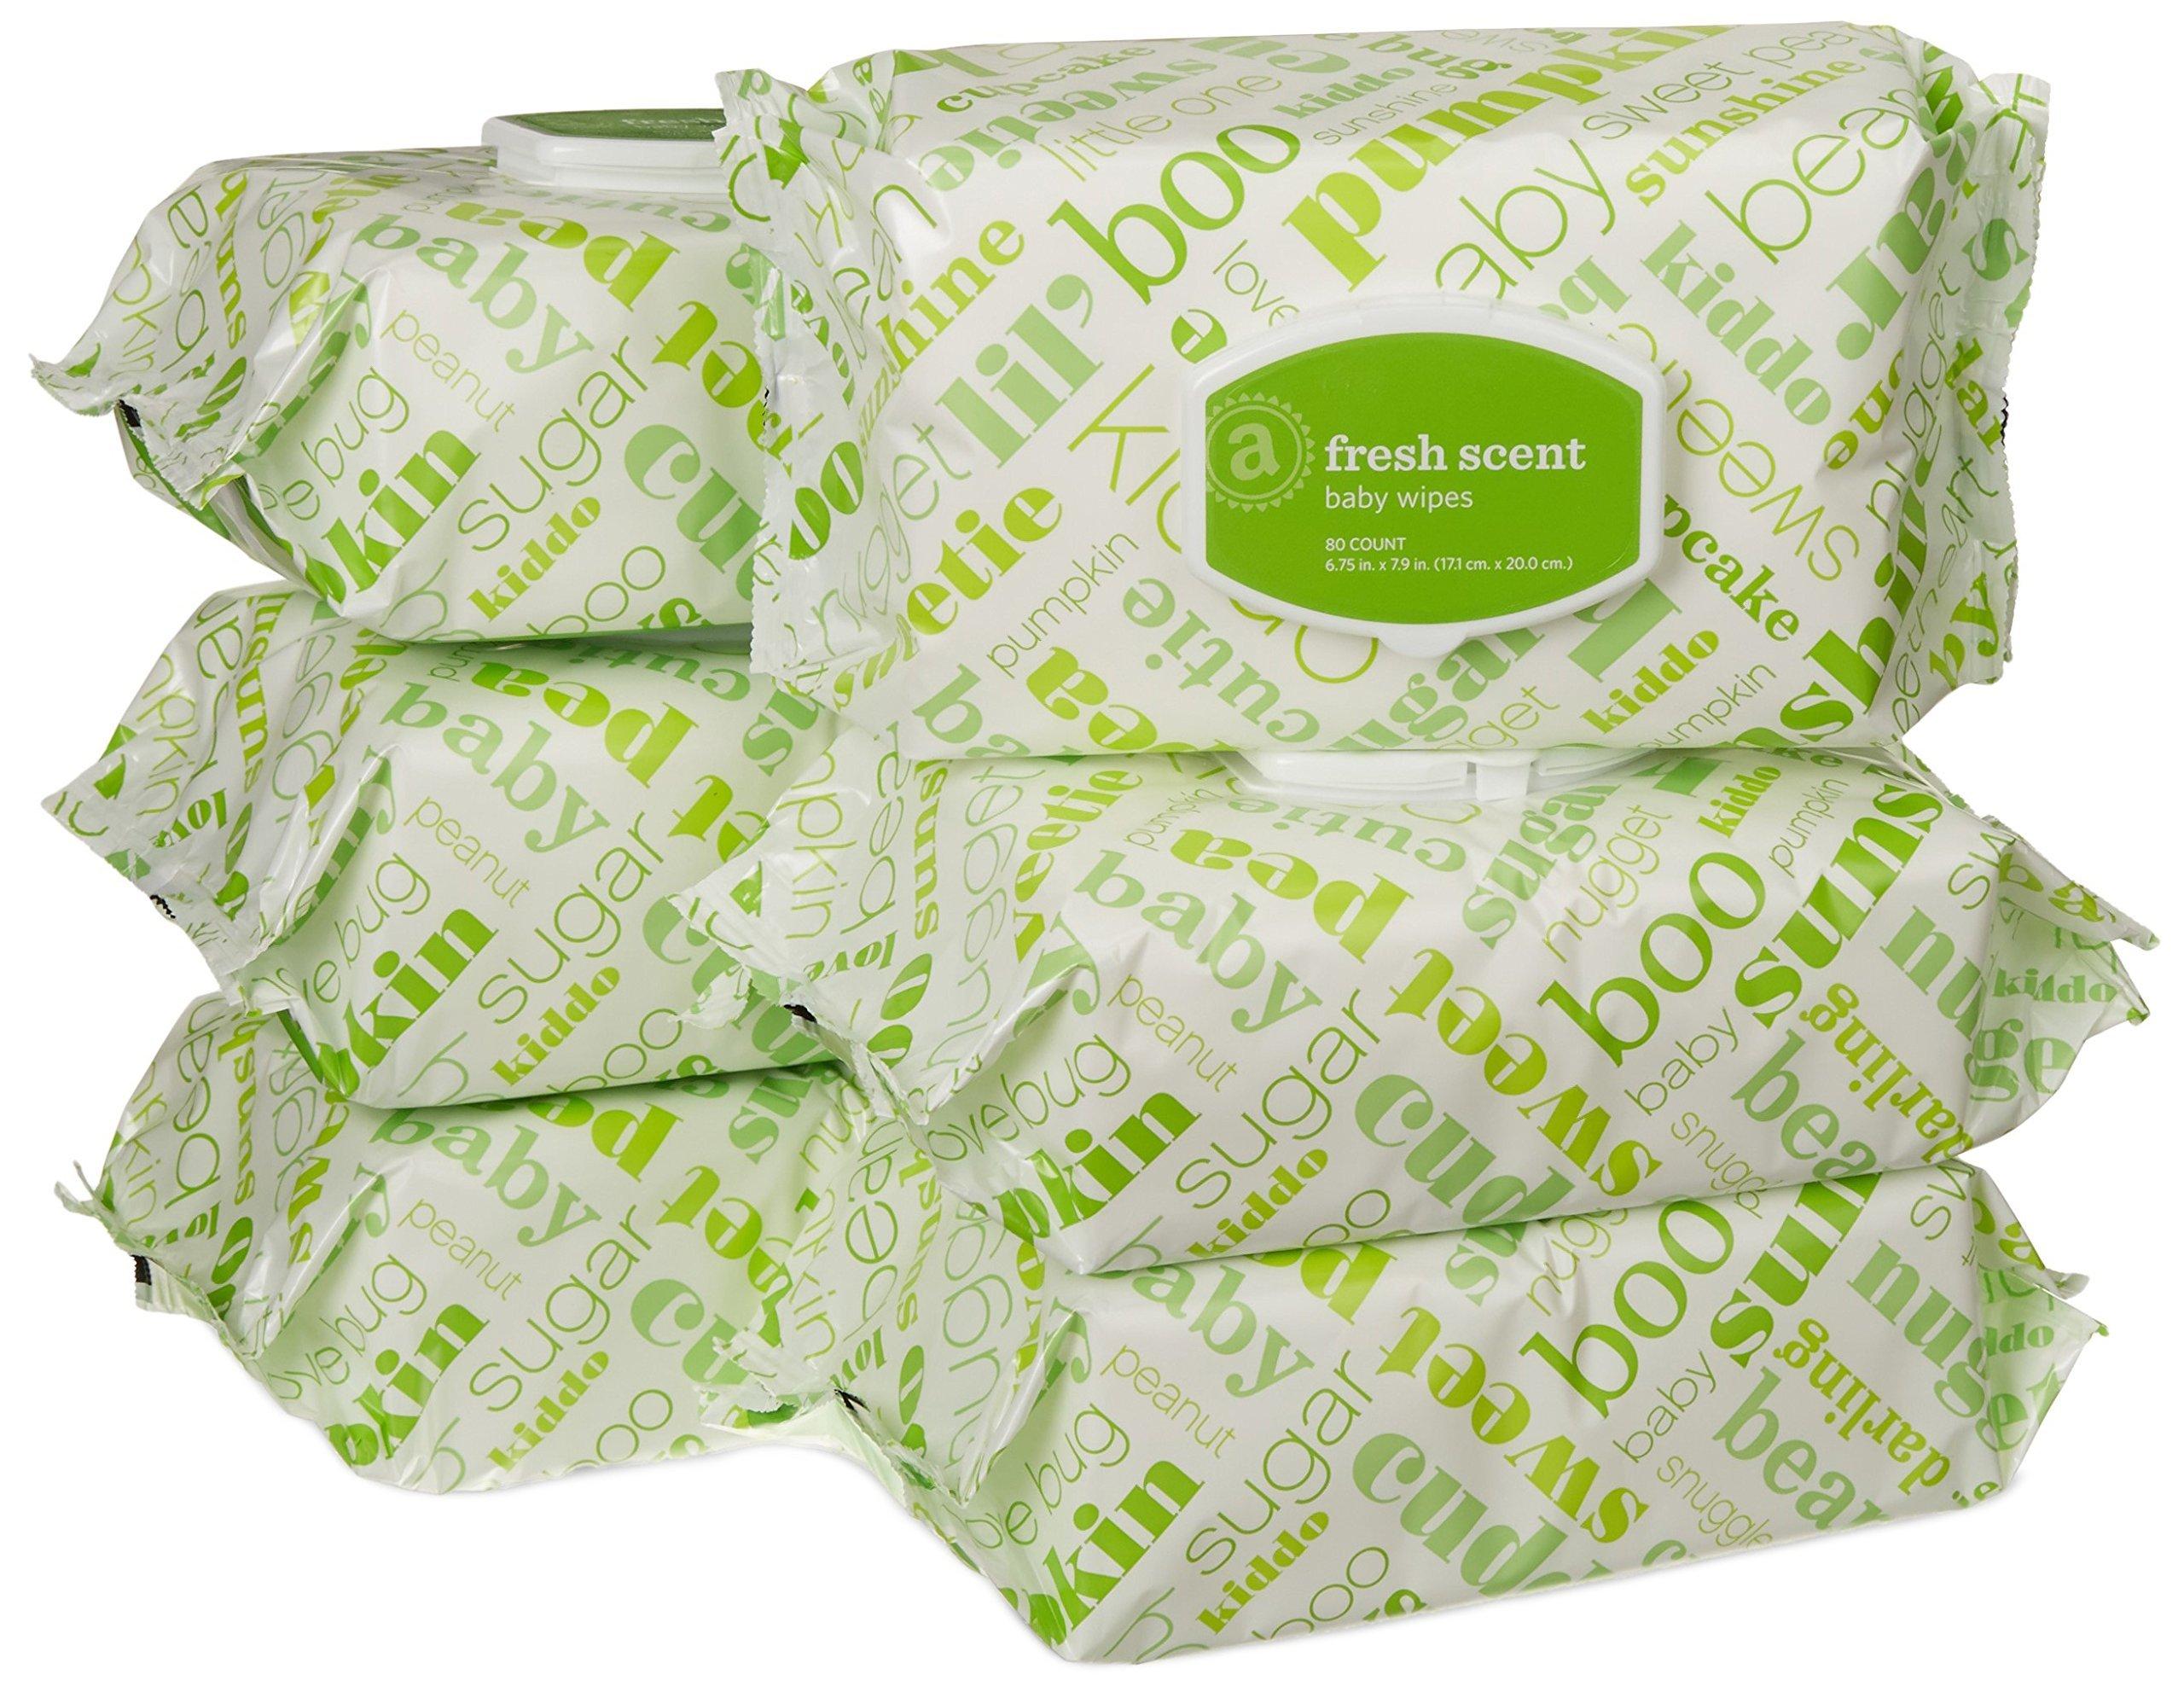 Amazon Elements Baby Wipes, Fresh Scent, 480 Count, Flip-Top Packs